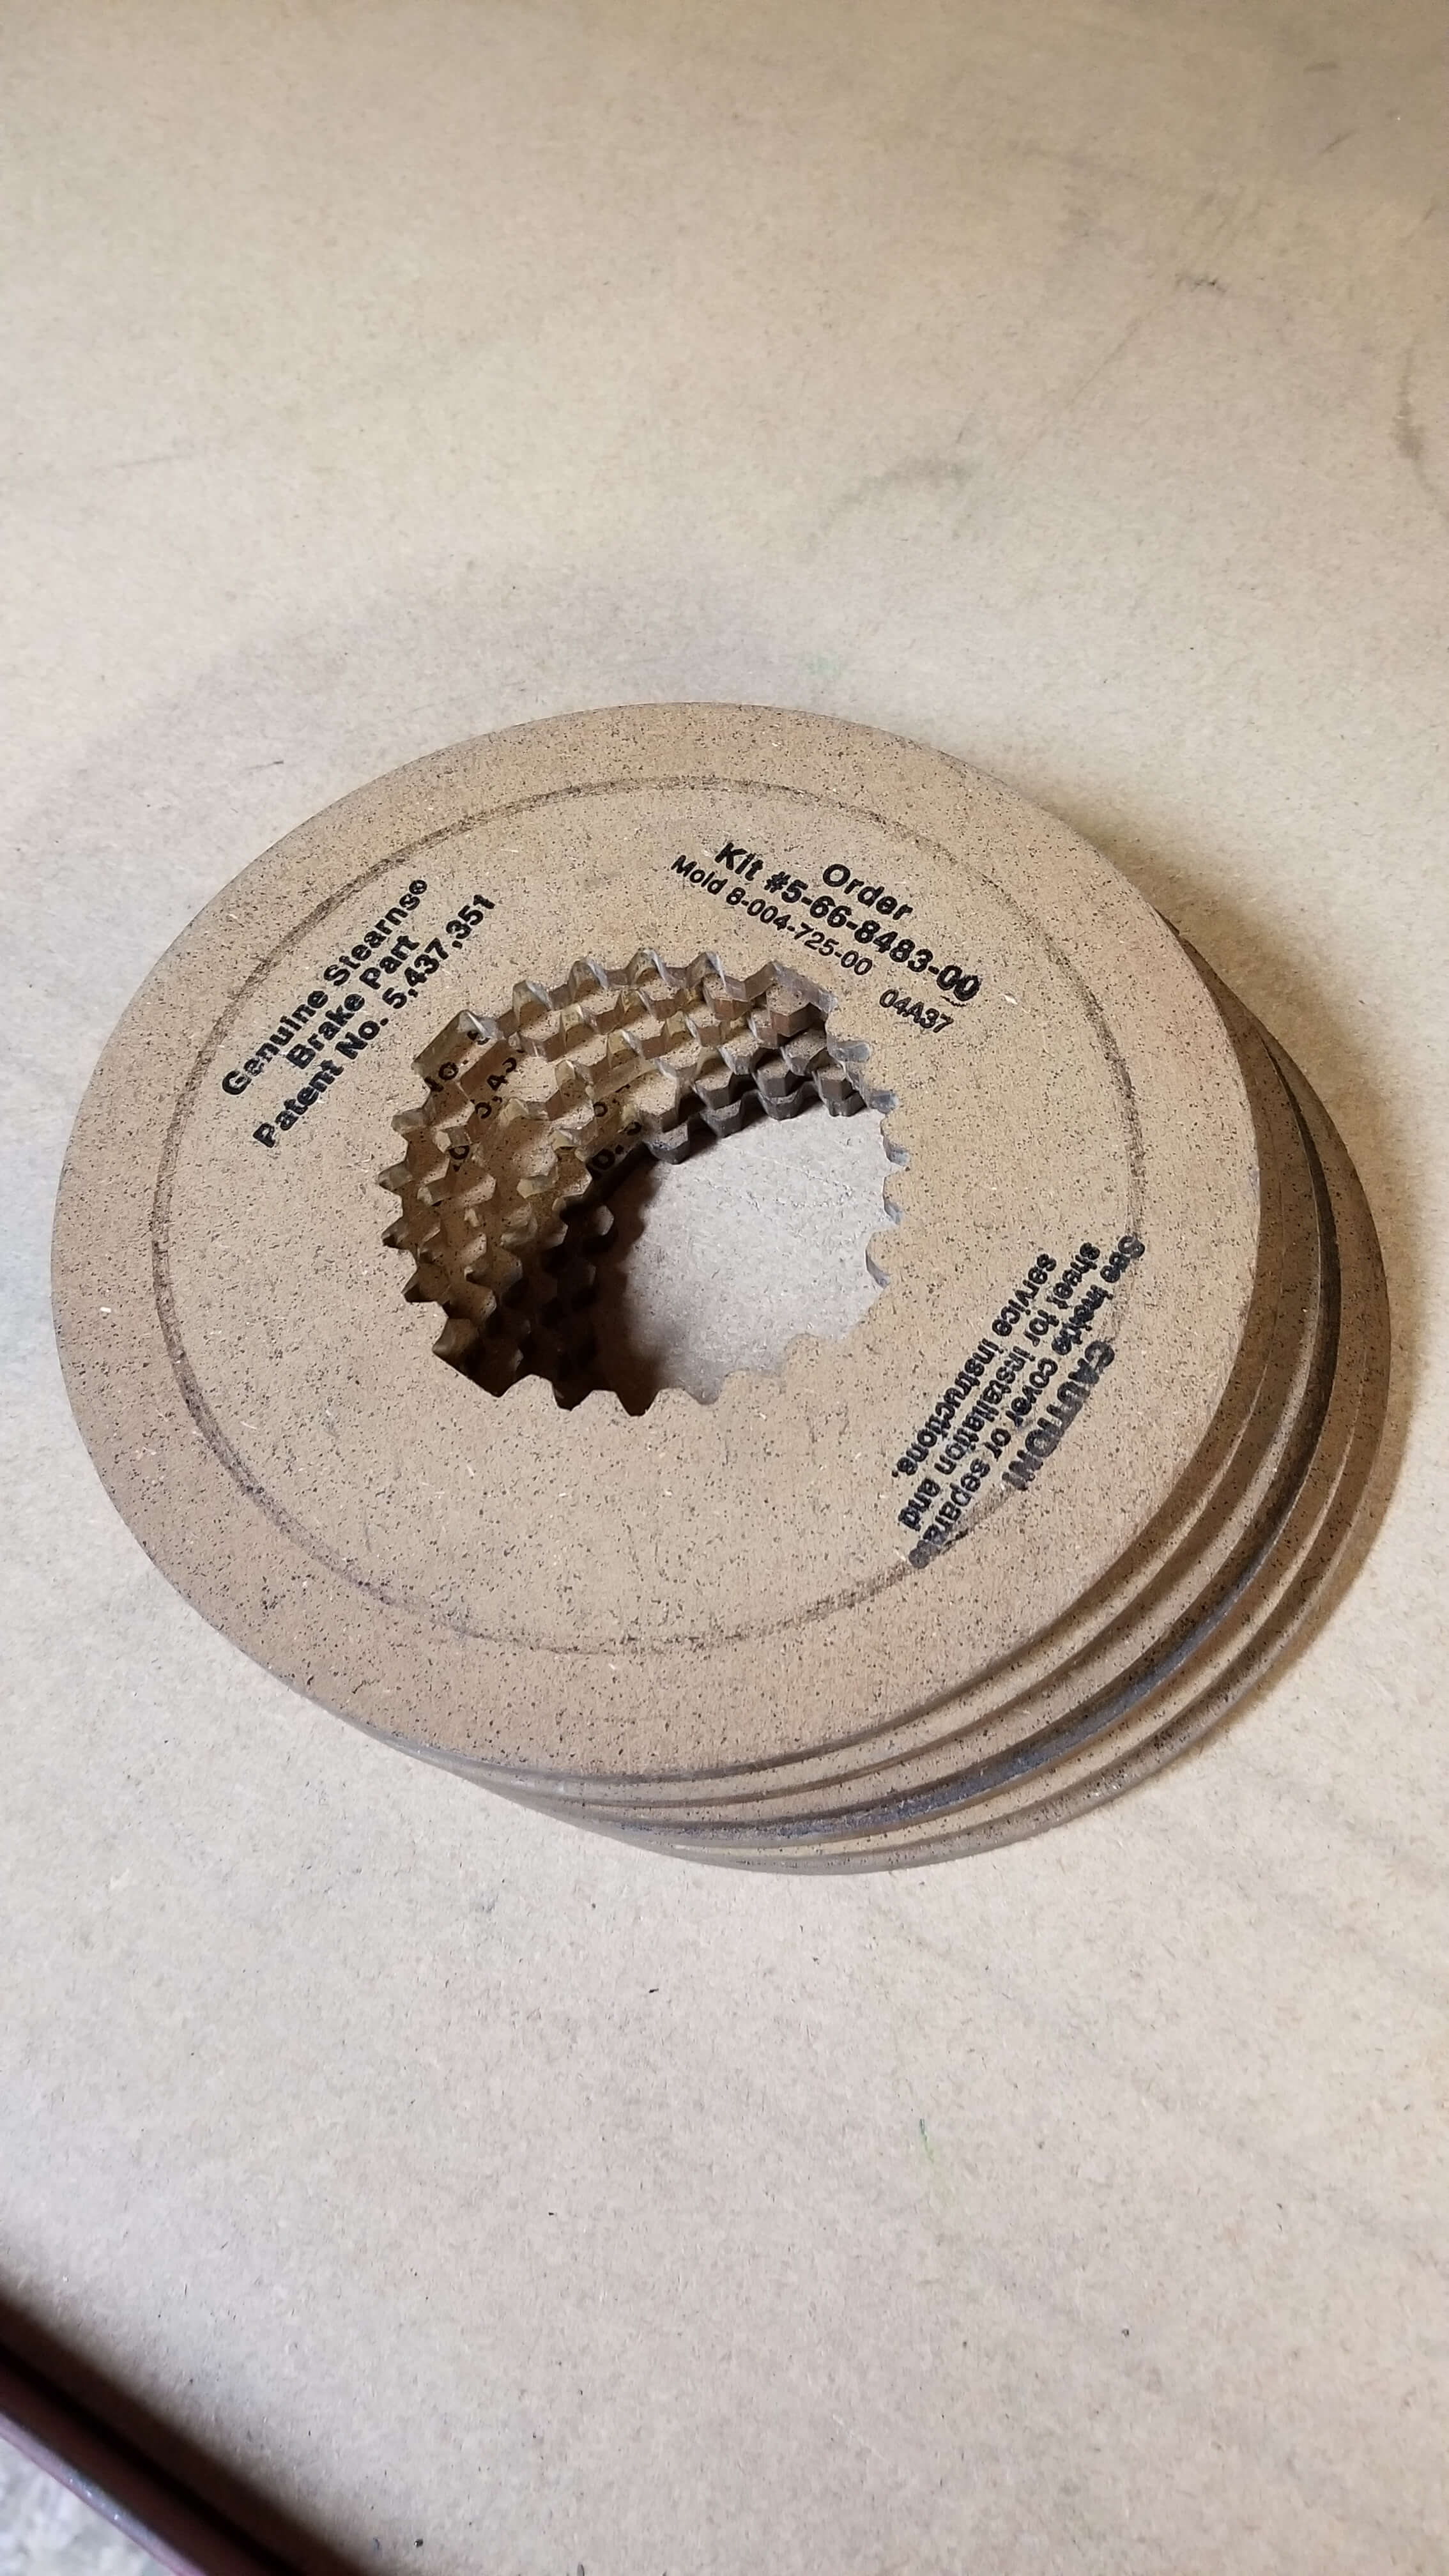 Stearns Brake Disc  P/N: 5 66 8483 00 $225.00/pc